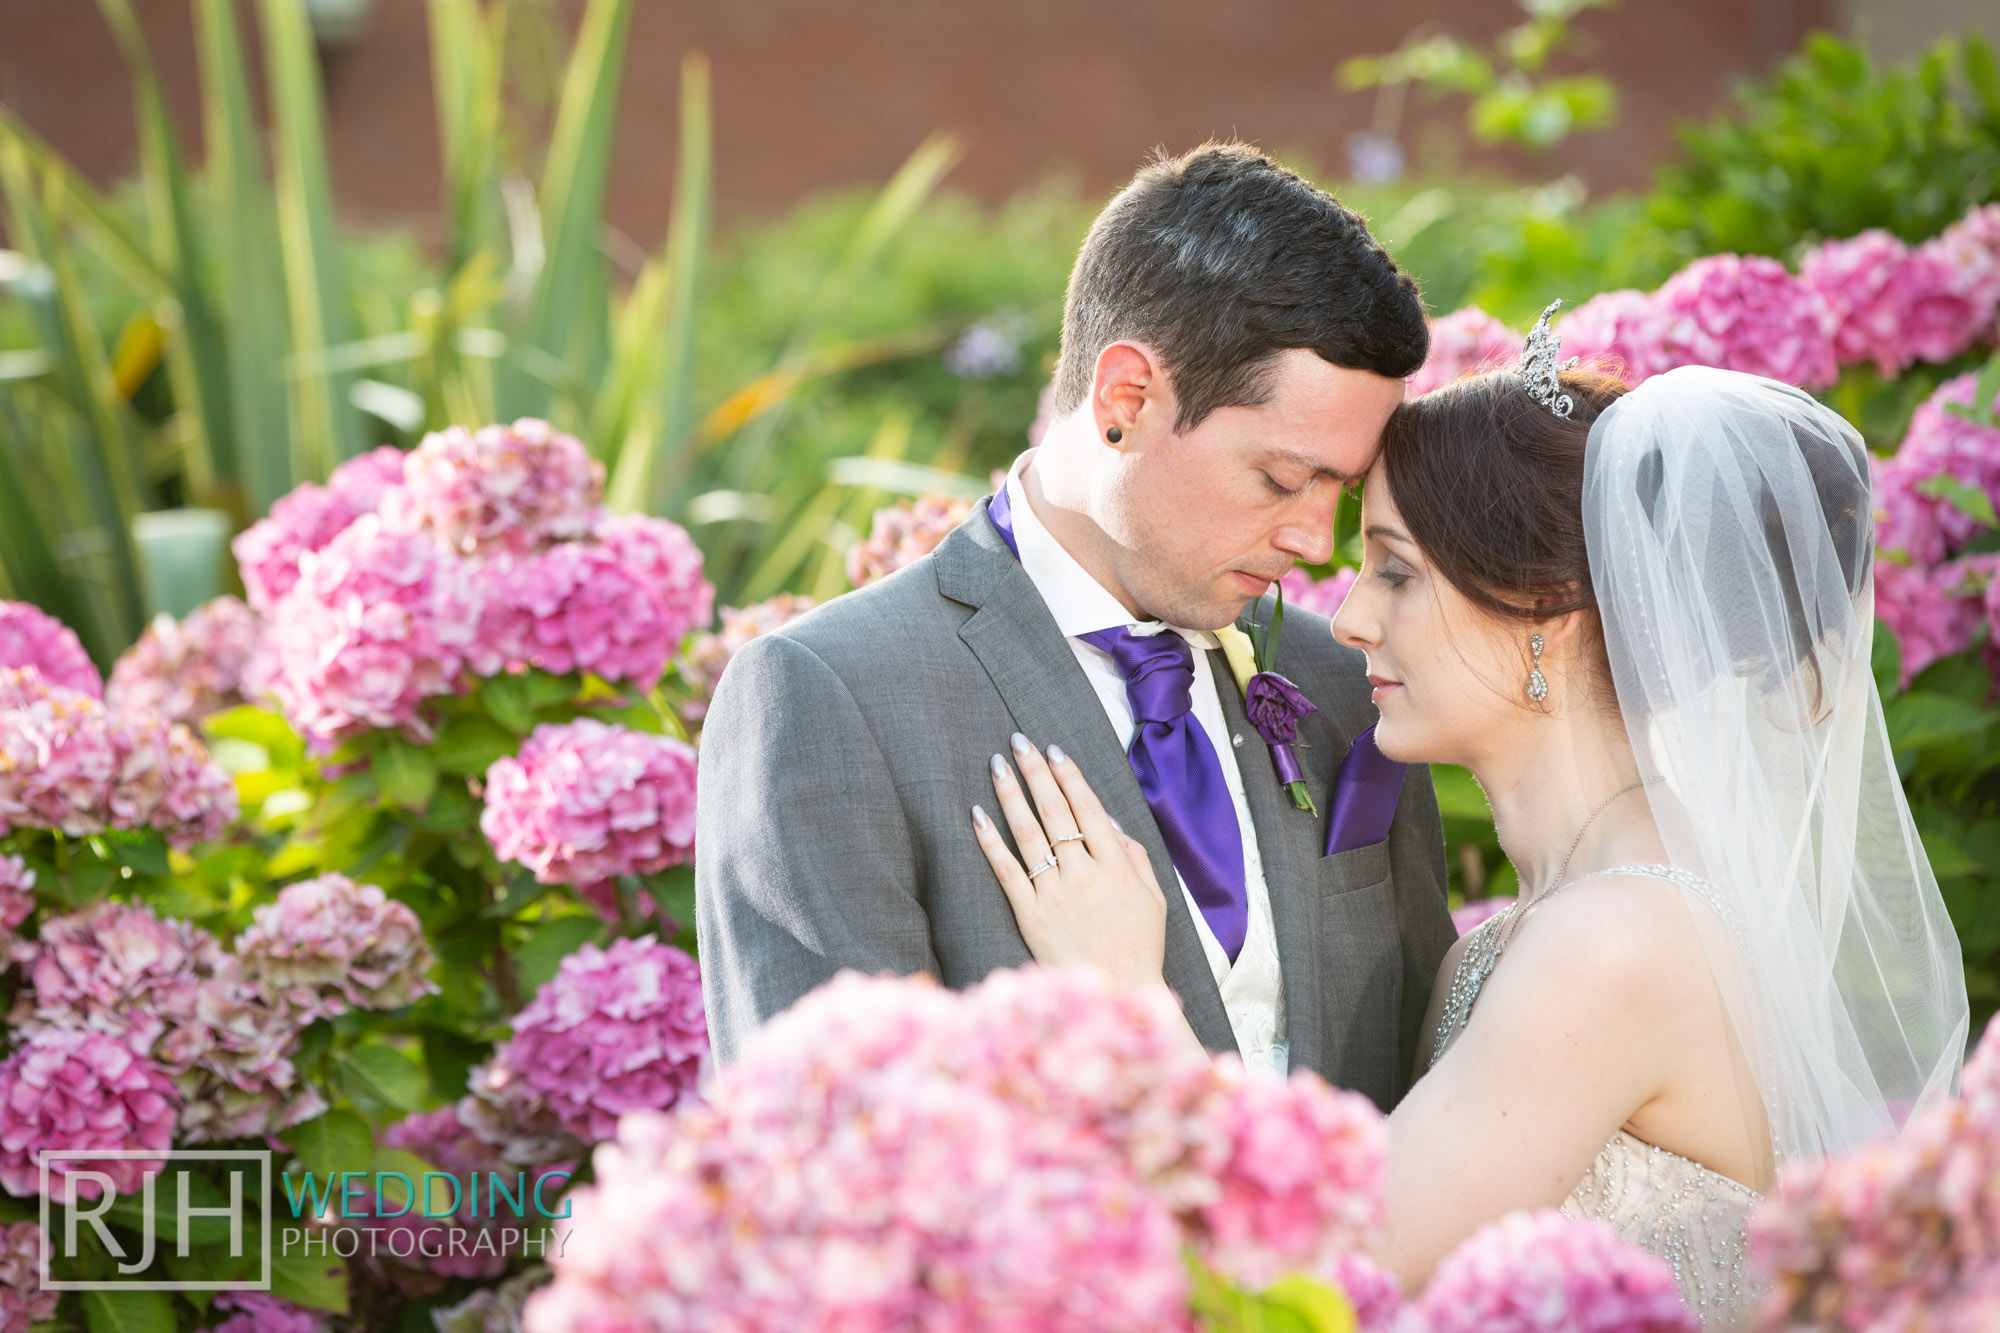 Oulton Hall Wedding Photography_Goodwill-Hall_047_RJH18223.jpg